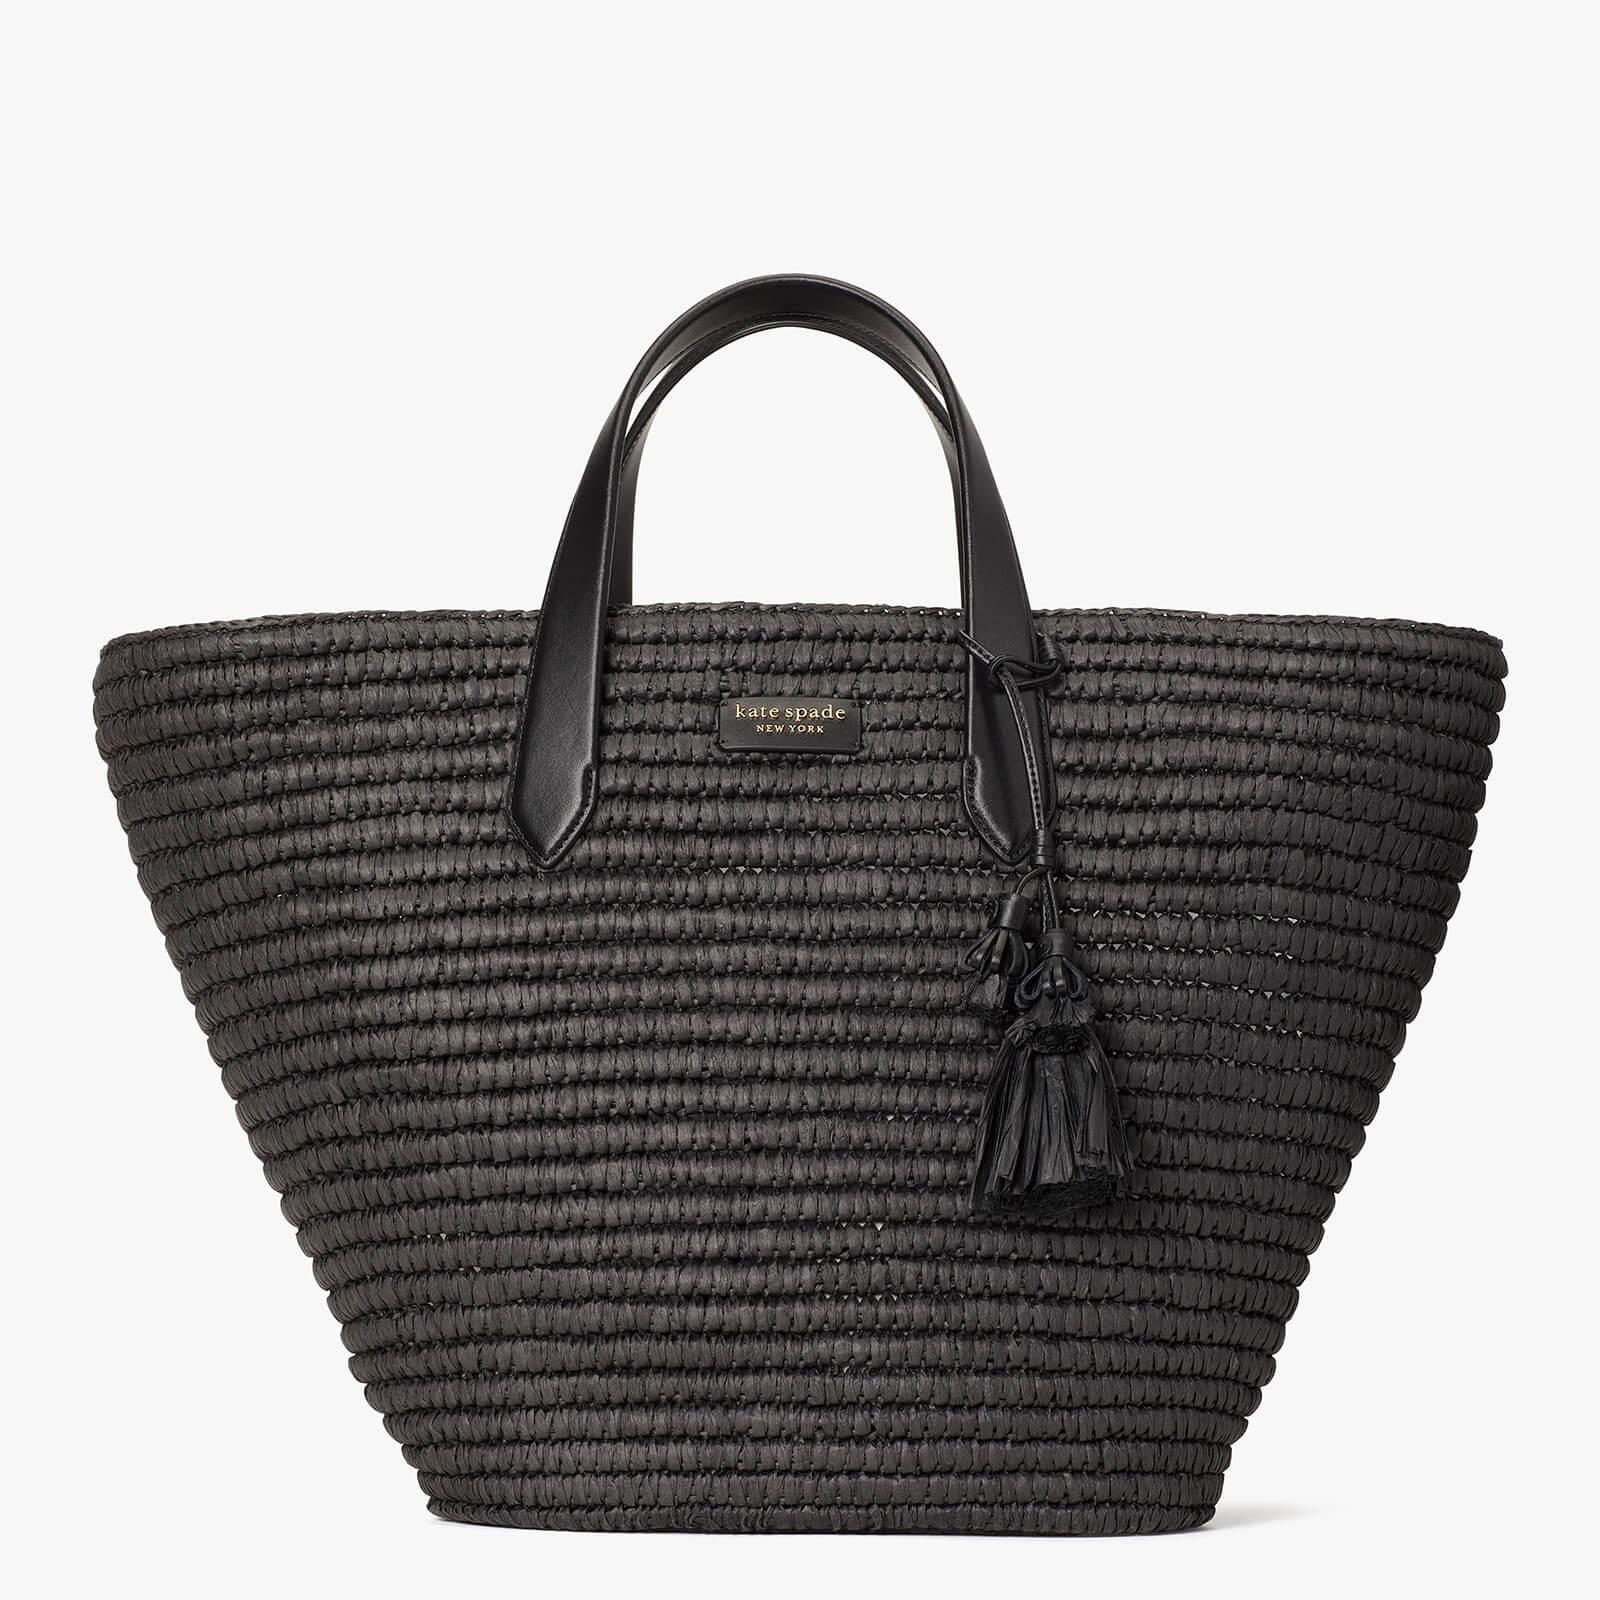 Kate Spade New York Women's Cabana Large Tote Bag - Black